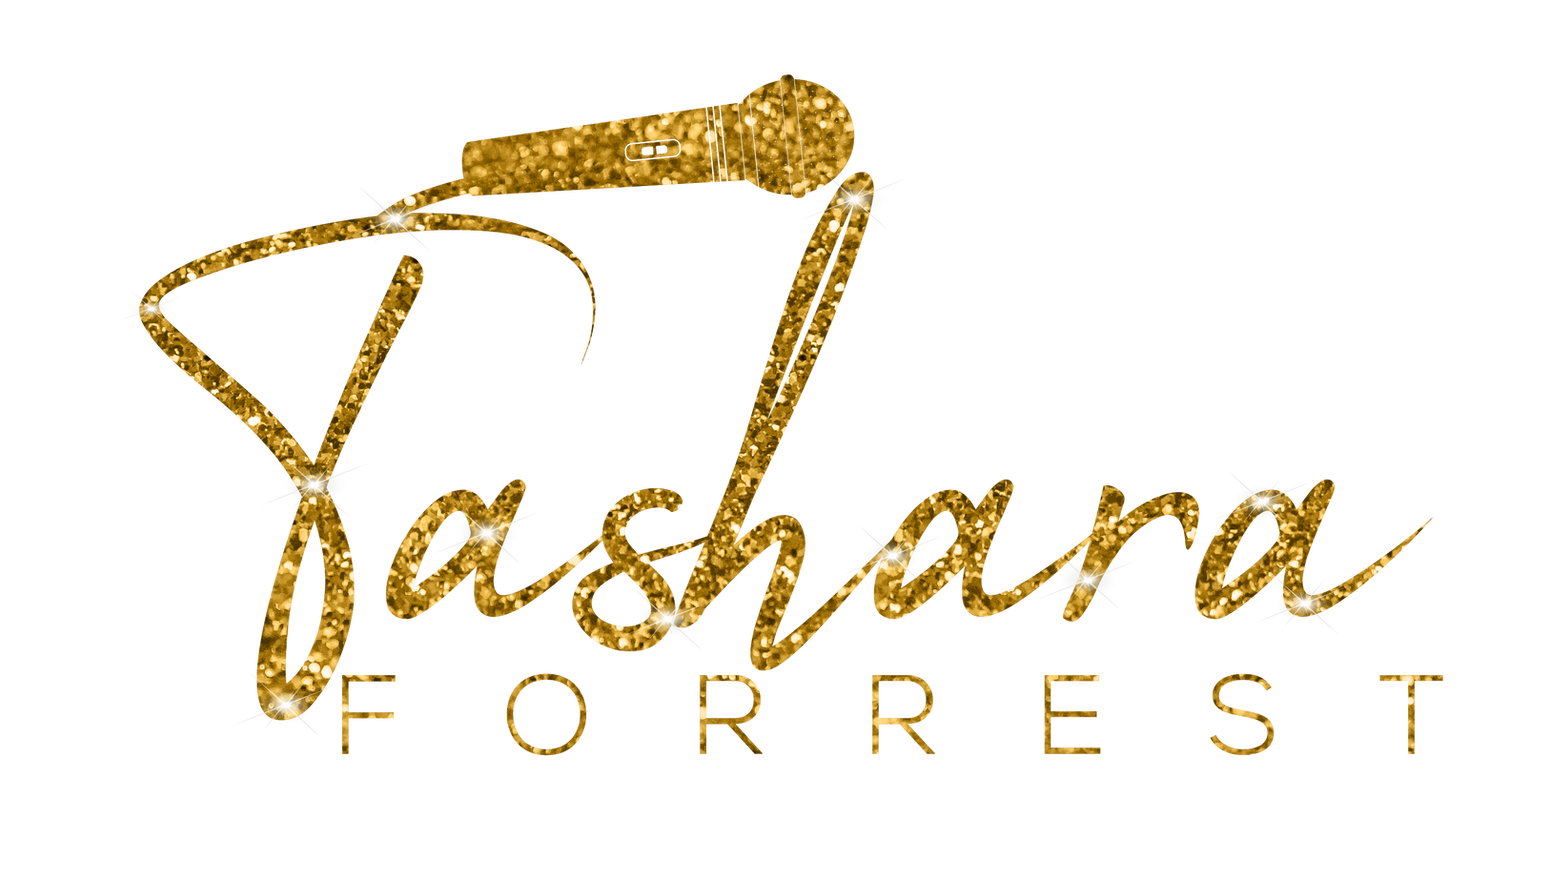 Tashara Forrest